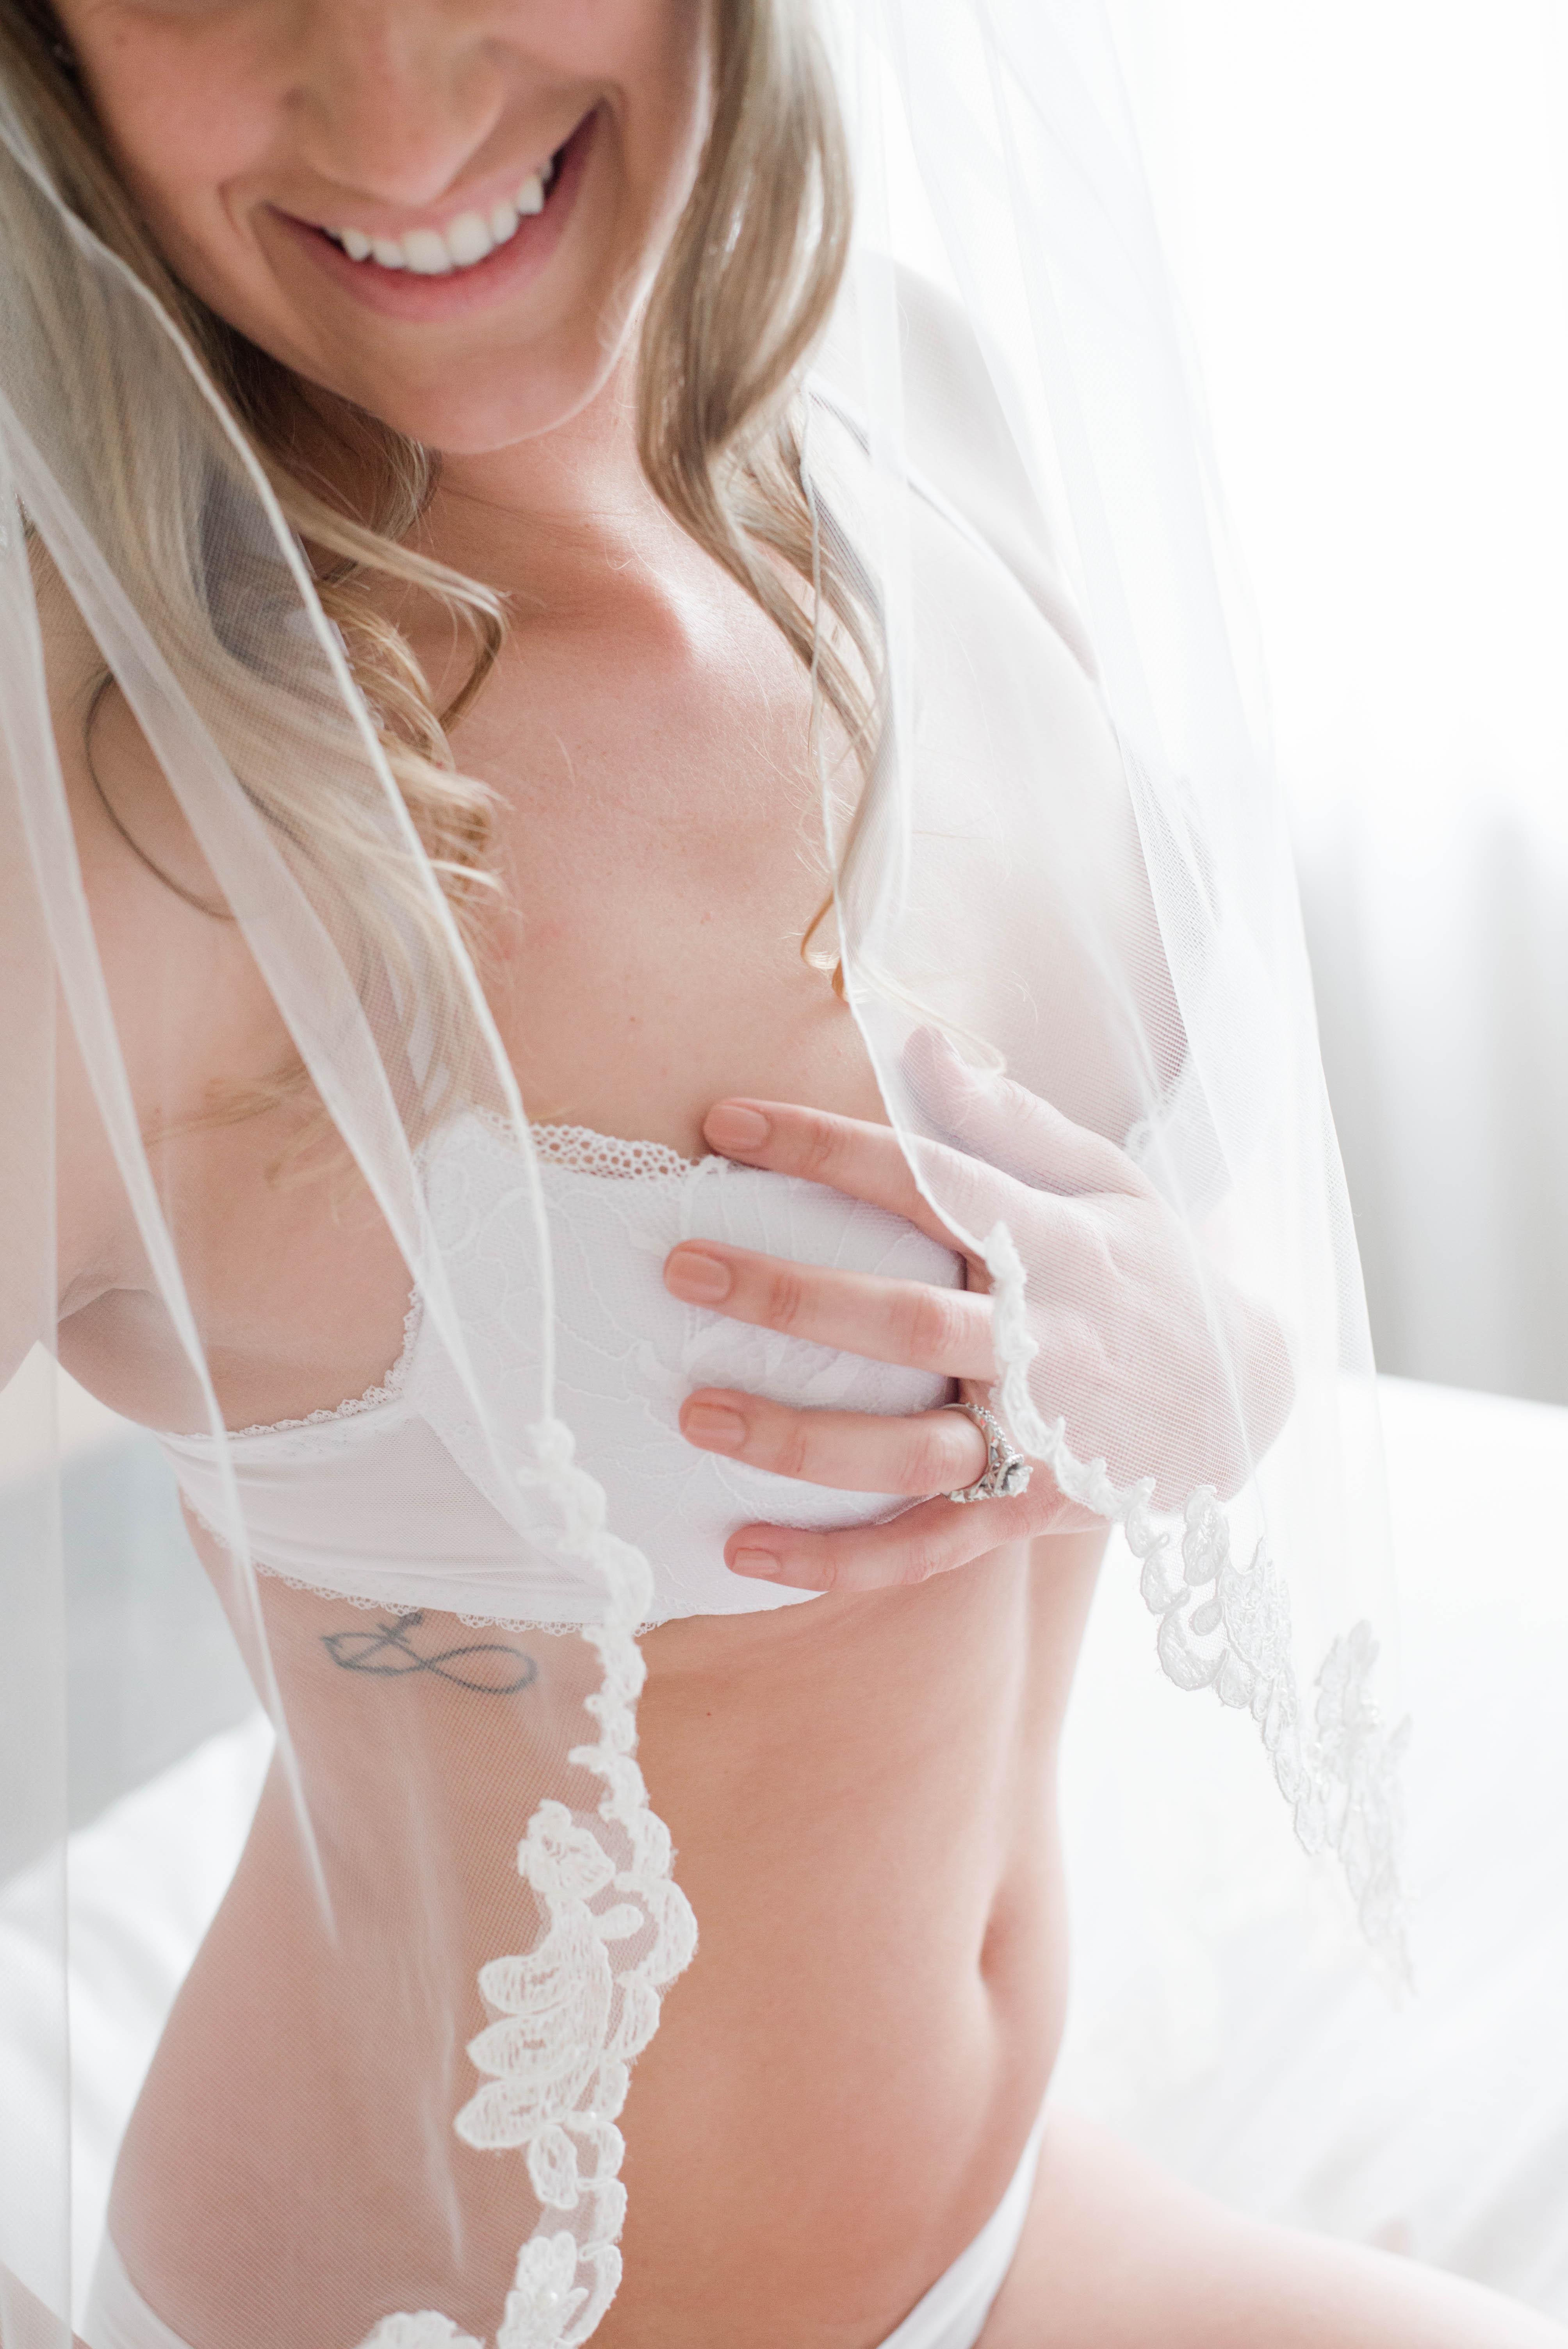 Main_Line_Pennsylvania_Luxury_Photographer_Boudoir_Portrait_Wedding_Philadelphia_Photography-52